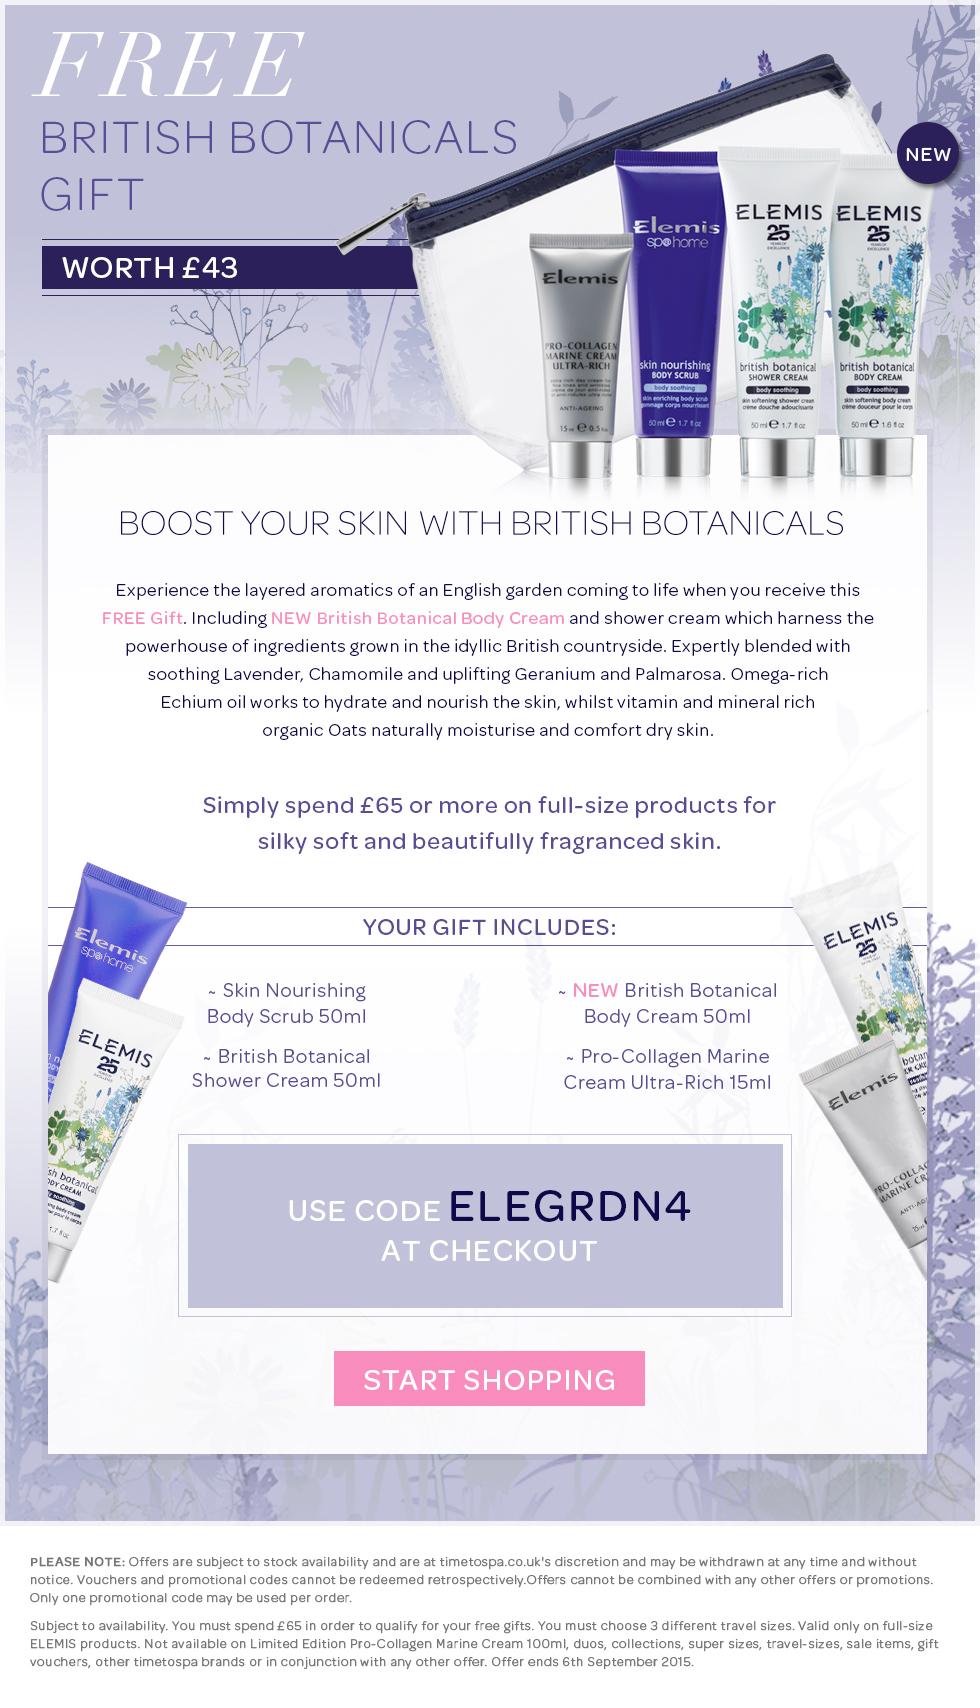 FREE ELEMIS British Botanical Body Cream – when you spend £65 or more